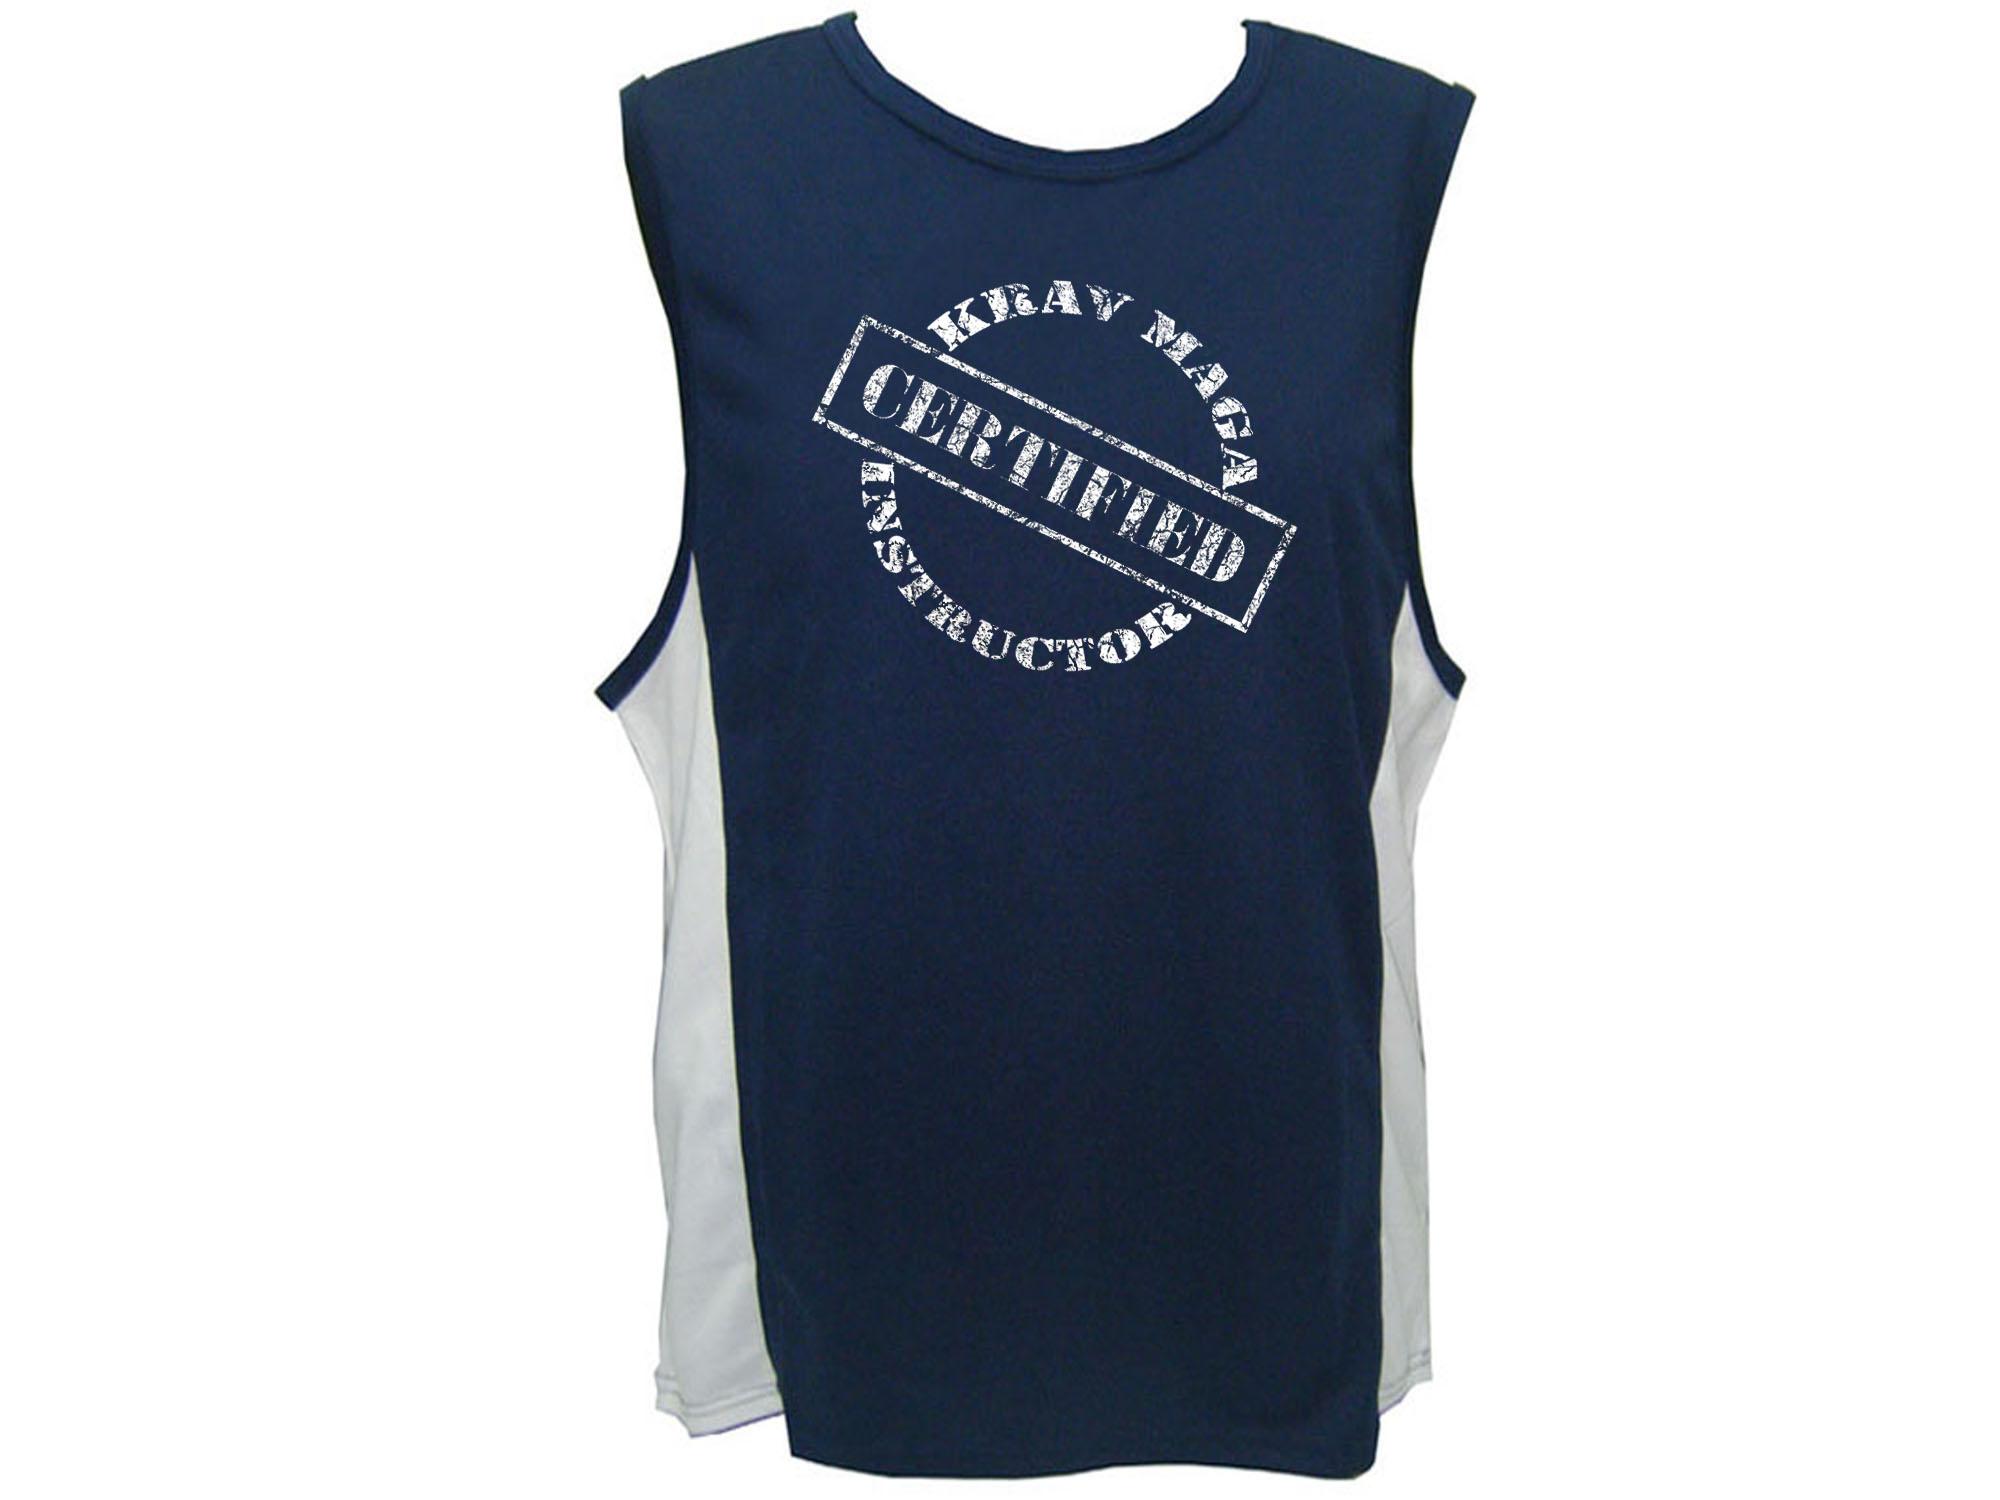 Krav maga martial arts israel1shop widest israel shop krav maga instructor certified sweat proof fabric workout tank top buycottarizona